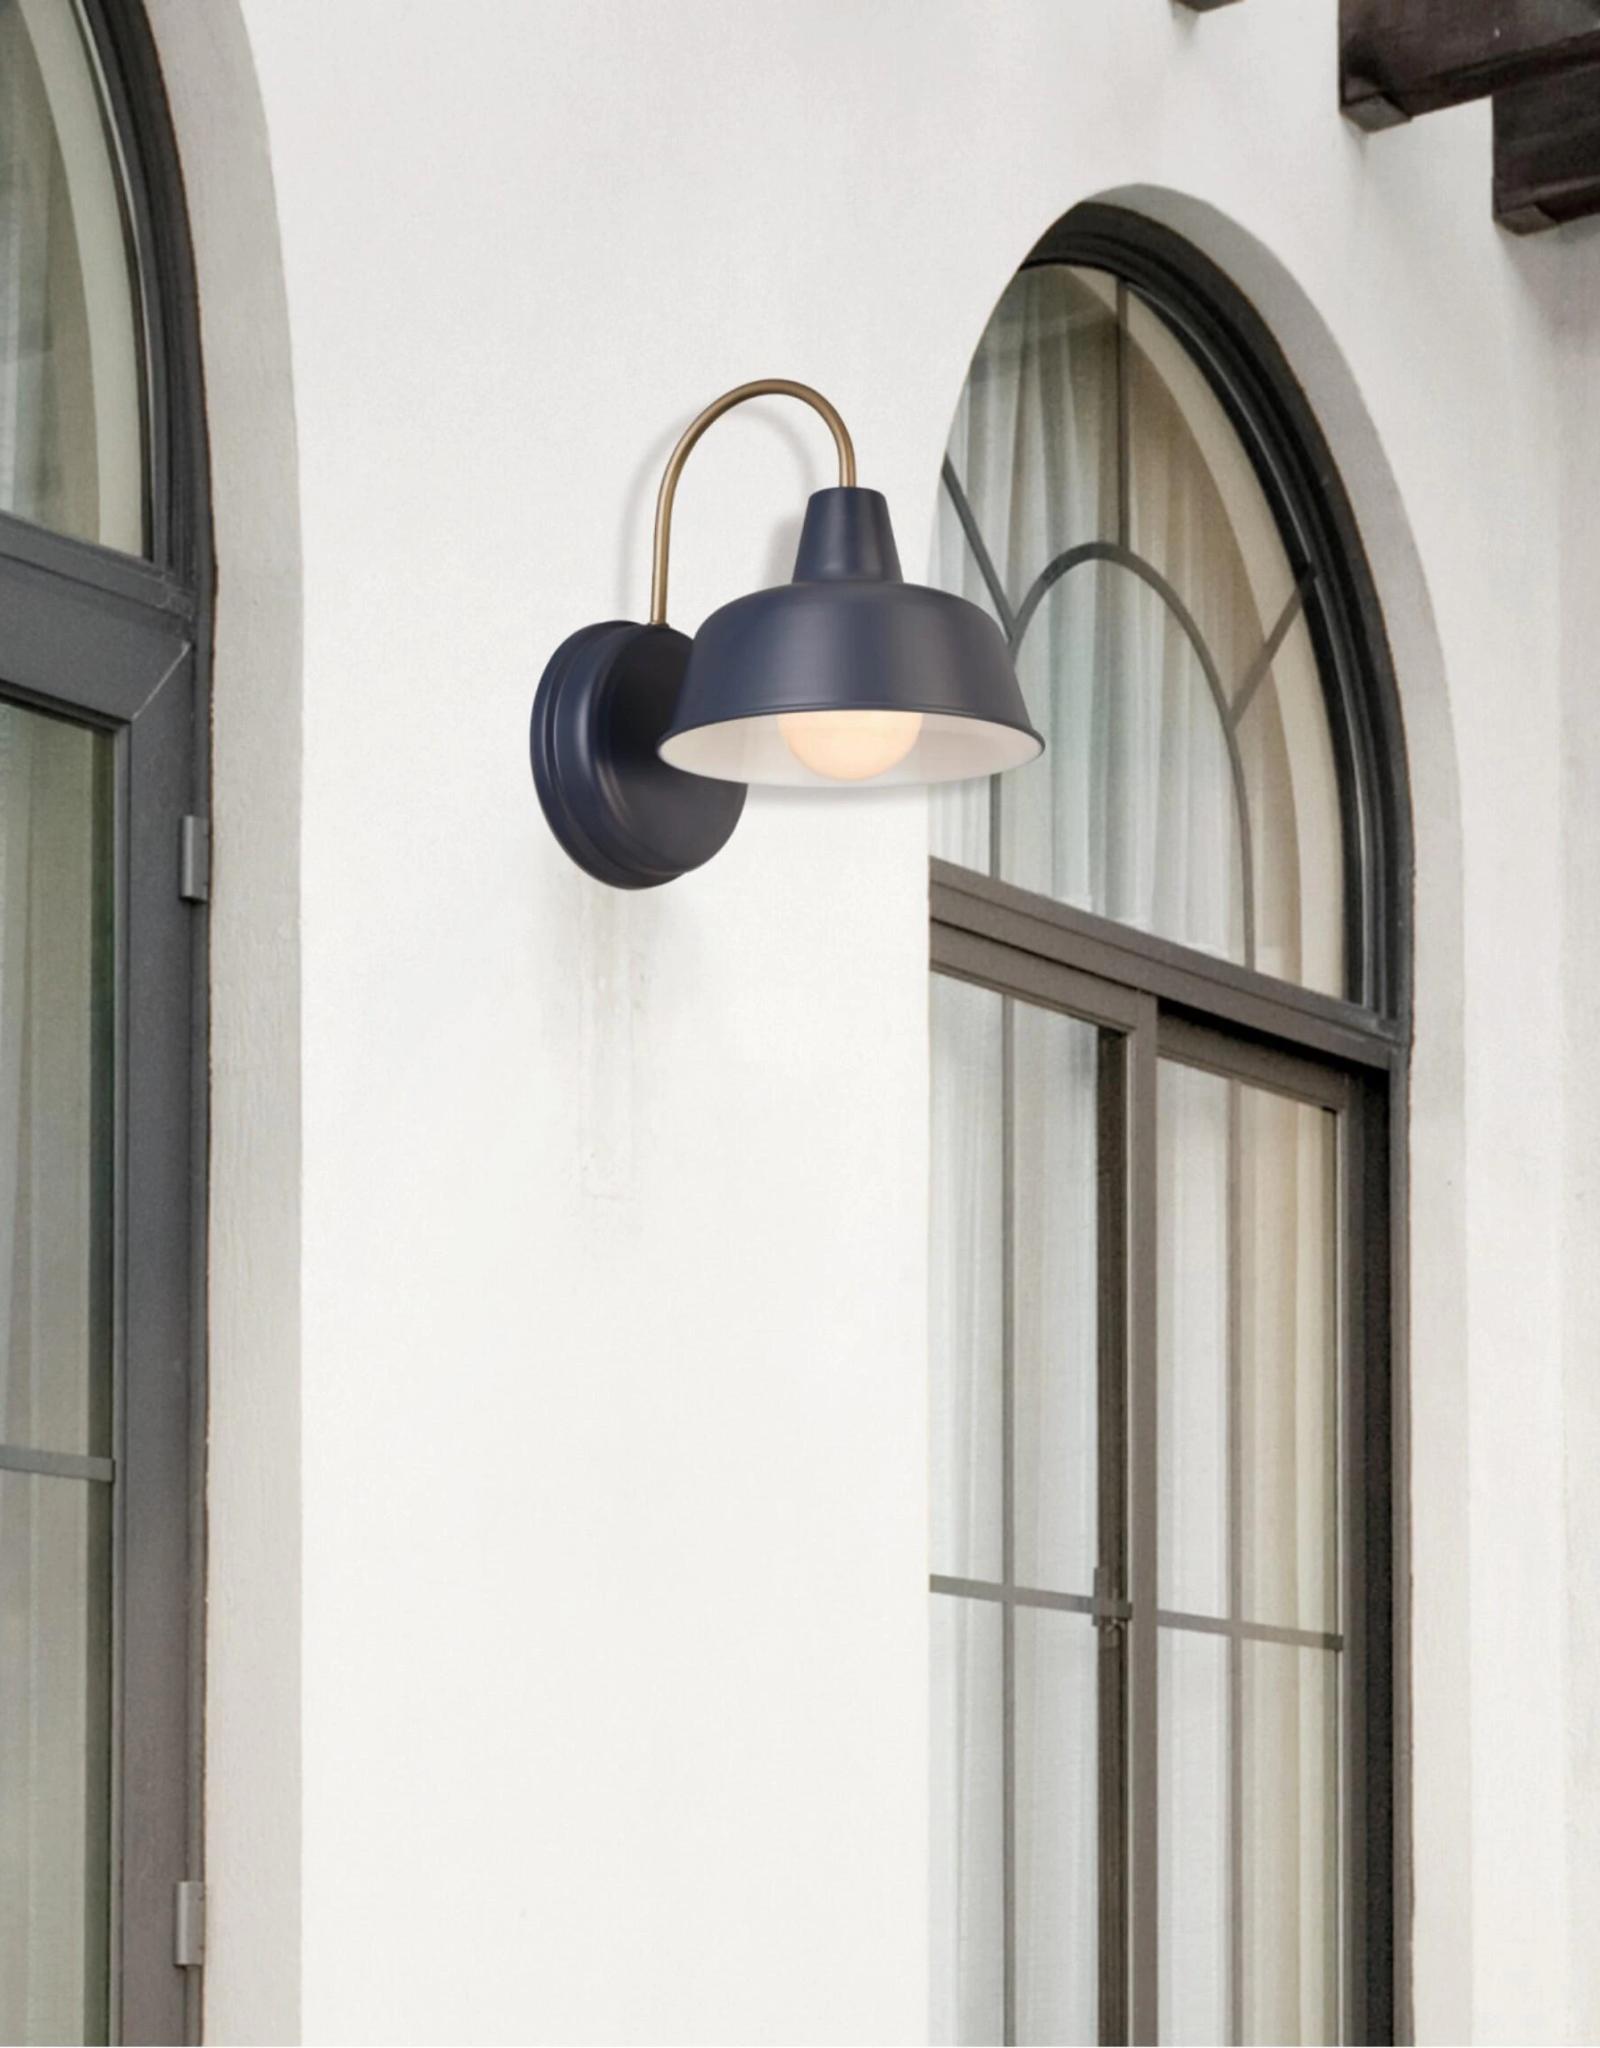 Design House Mason 1-Light Matte Navy and Gold Outdoor Wall Light Sconce